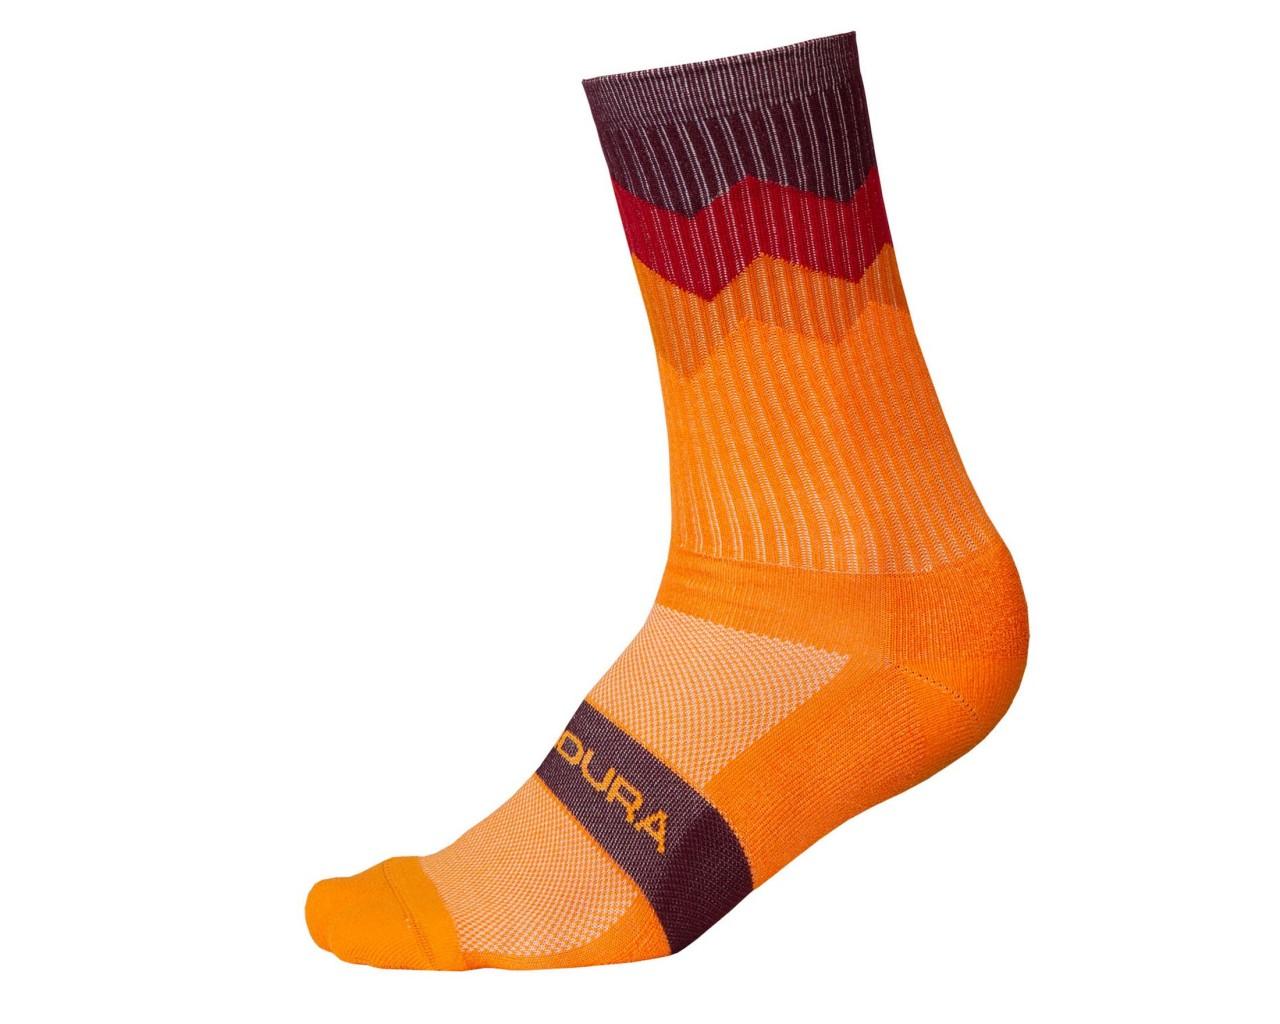 Endura Zacken Socken | mandarine